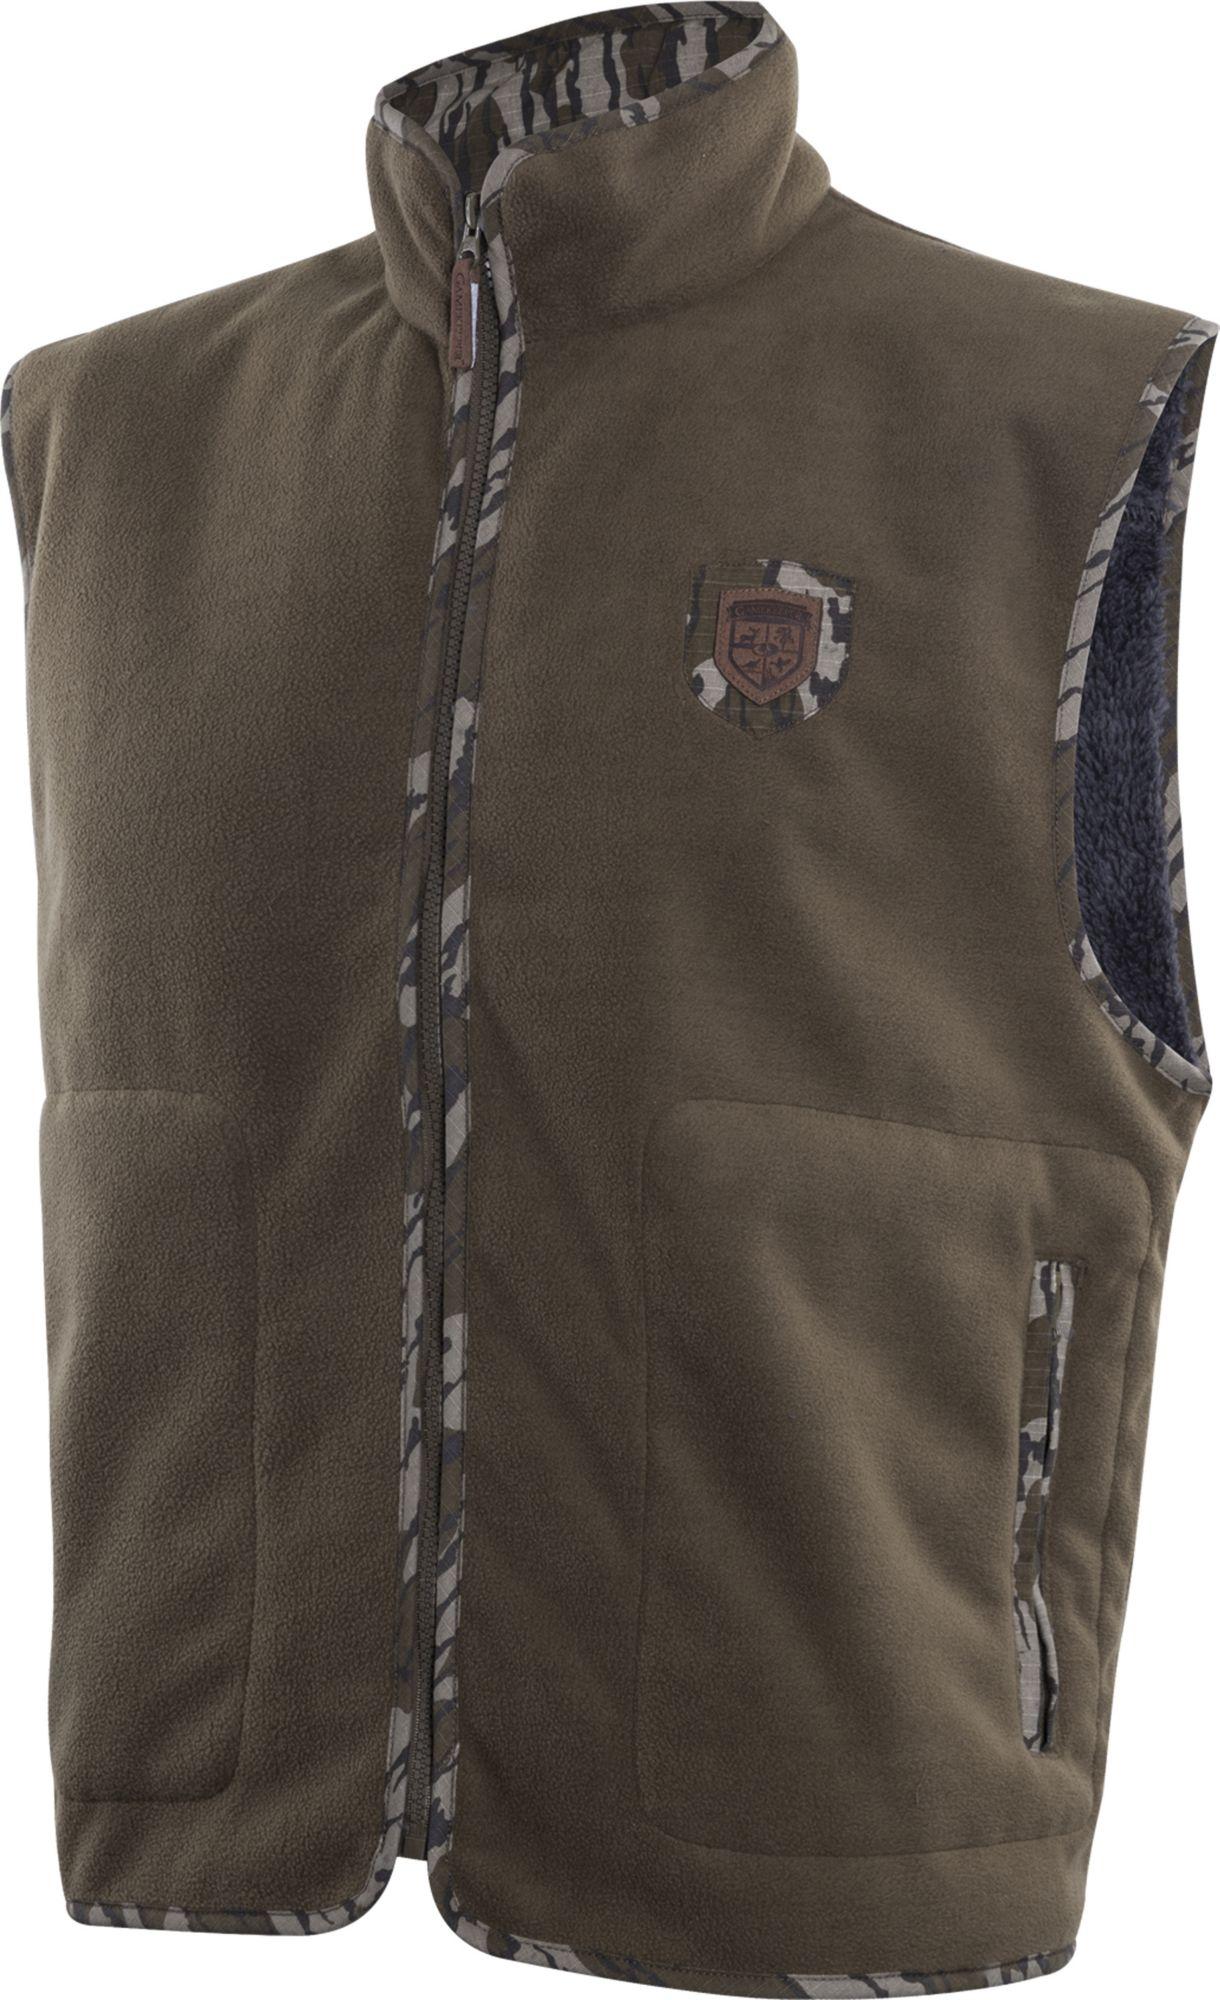 GameKeepers Men's Hitch Vest, Size: Medium, Brown thumbnail